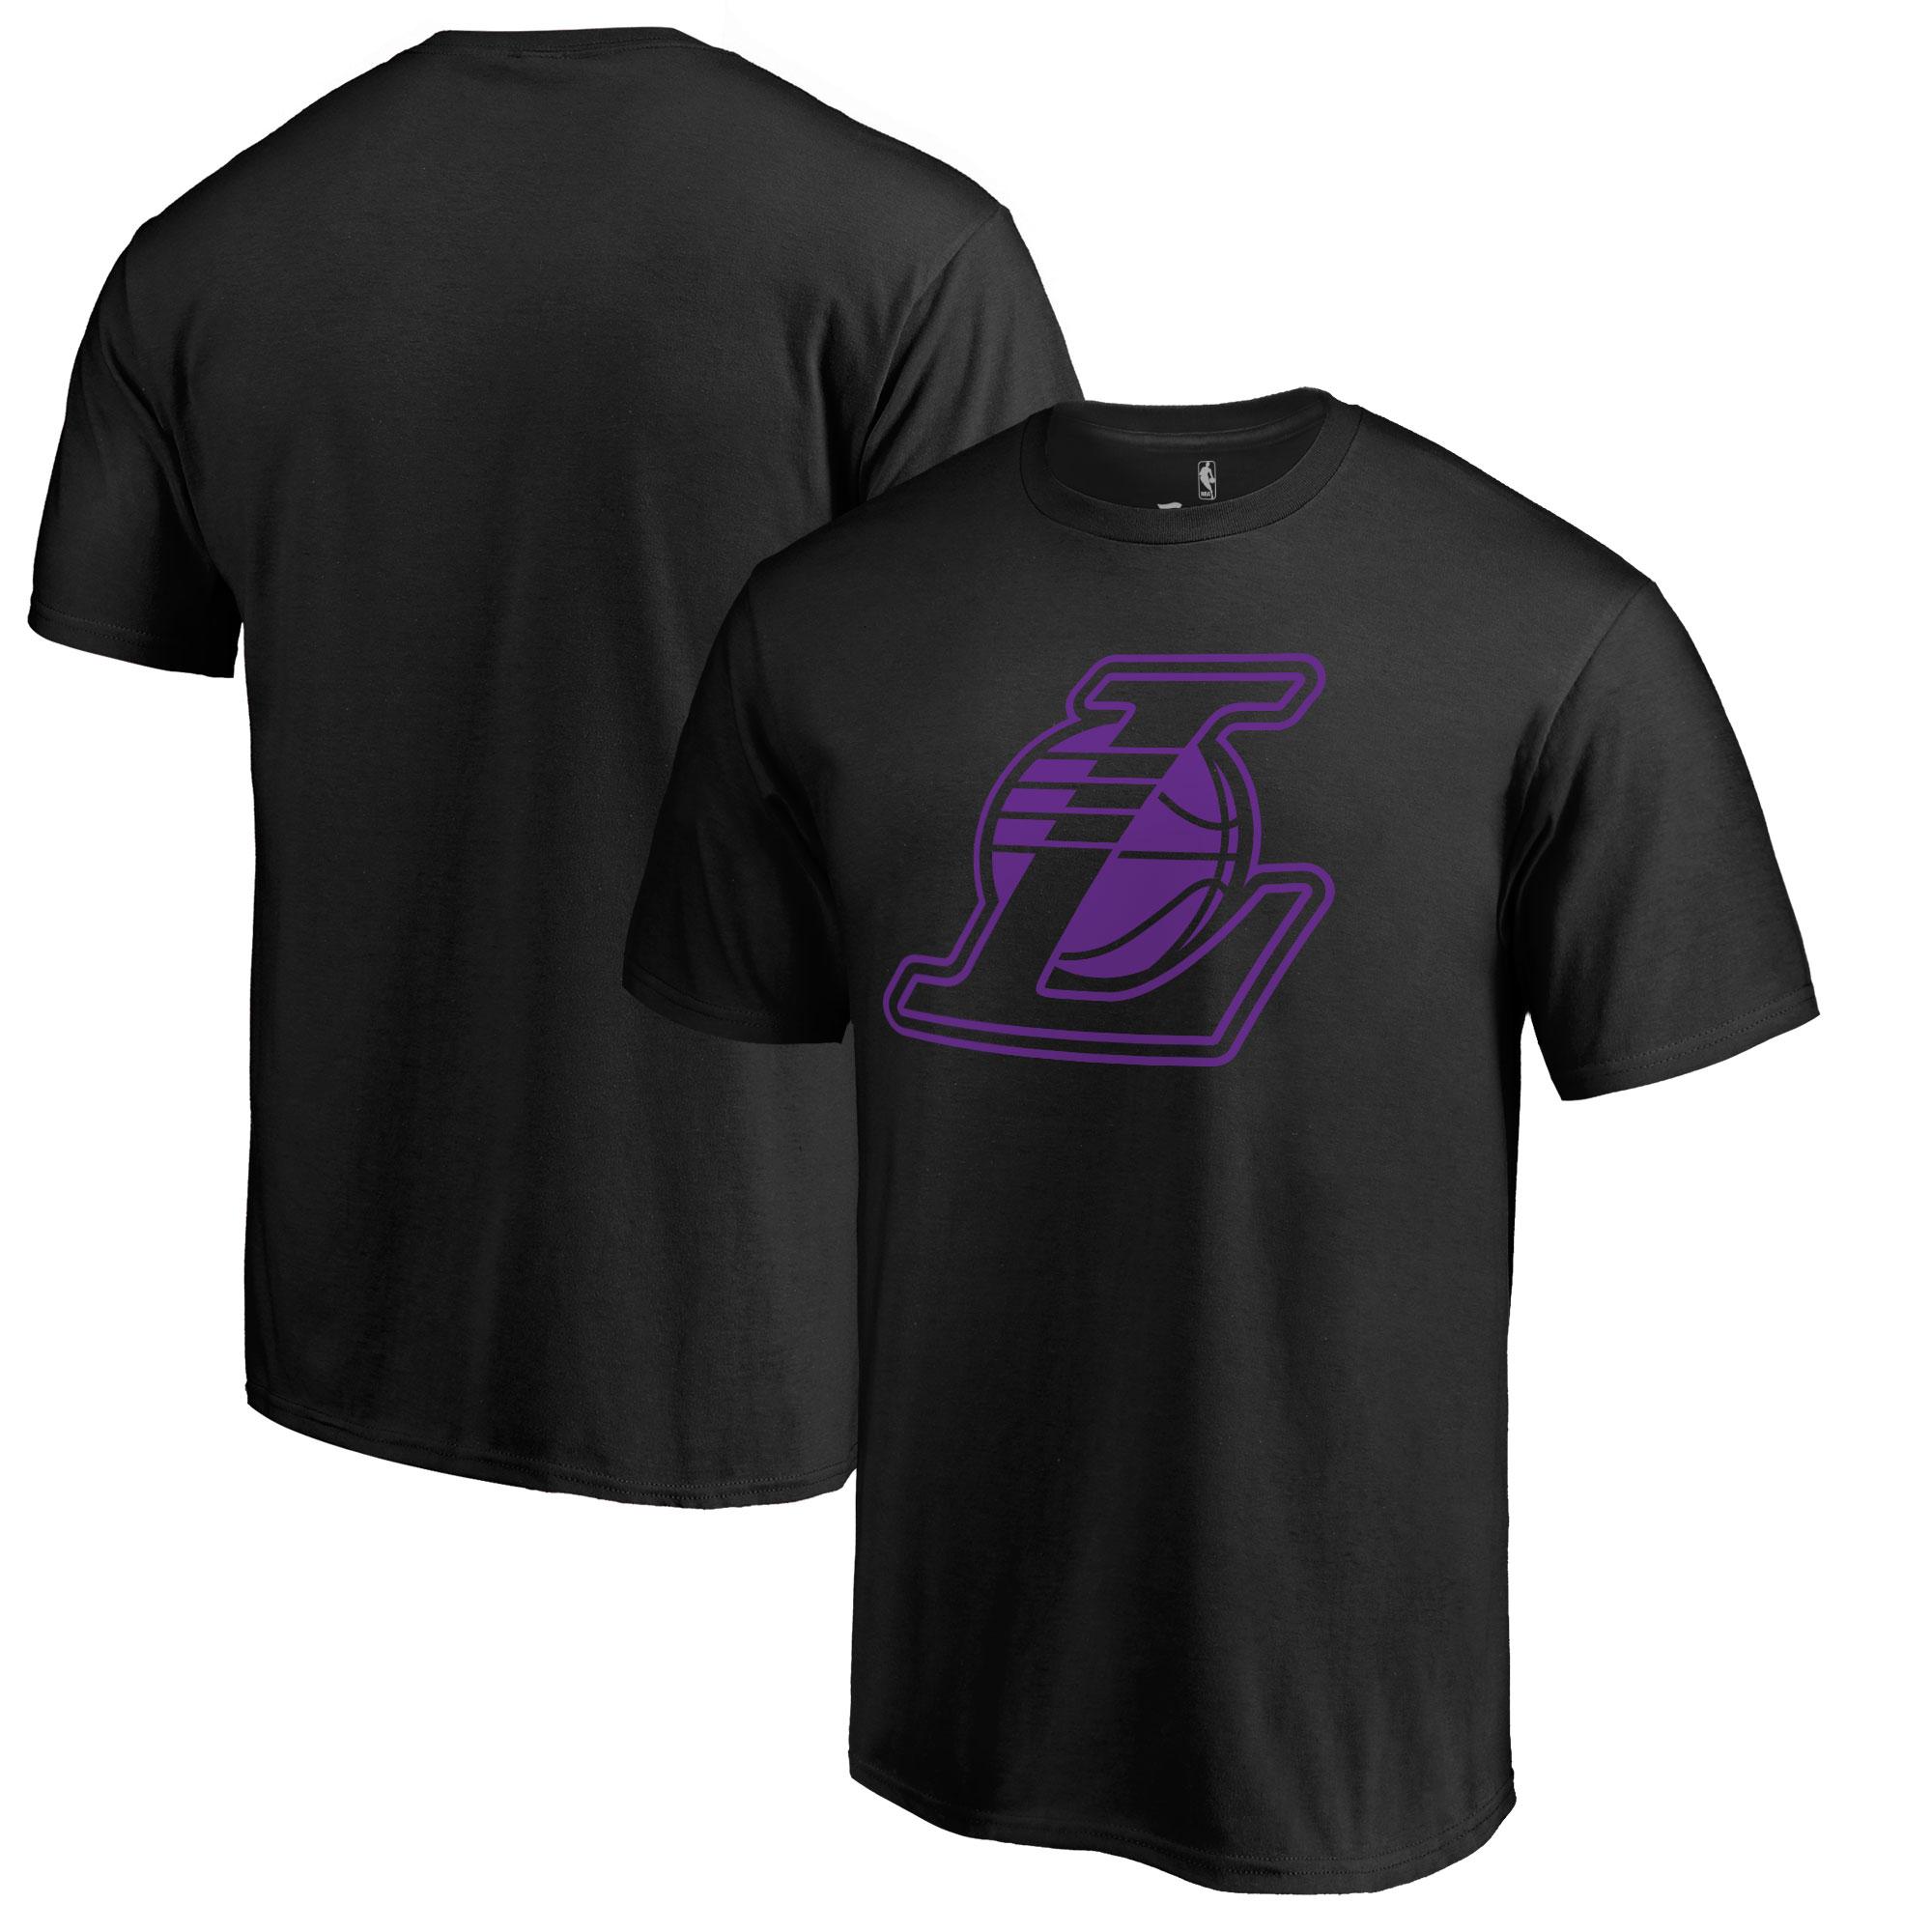 Los Angeles Lakers Fanatics Branded Big & Tall Taylor T-Shirt - Black